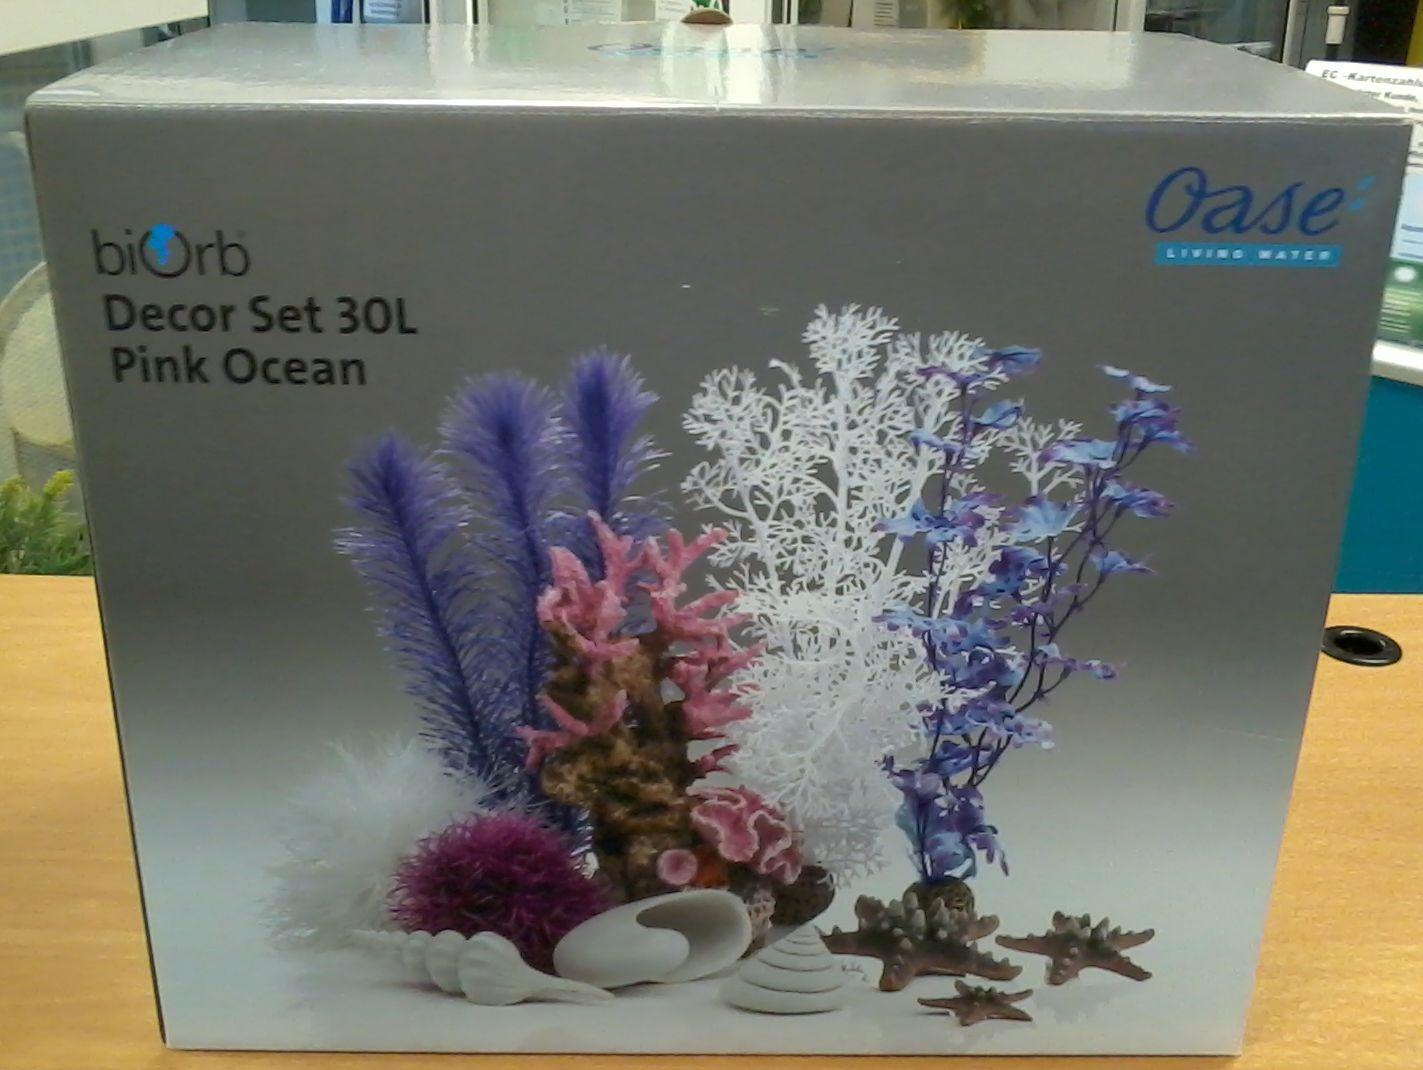 Oase biOrb DecorSet 30 Liter - pink ocean